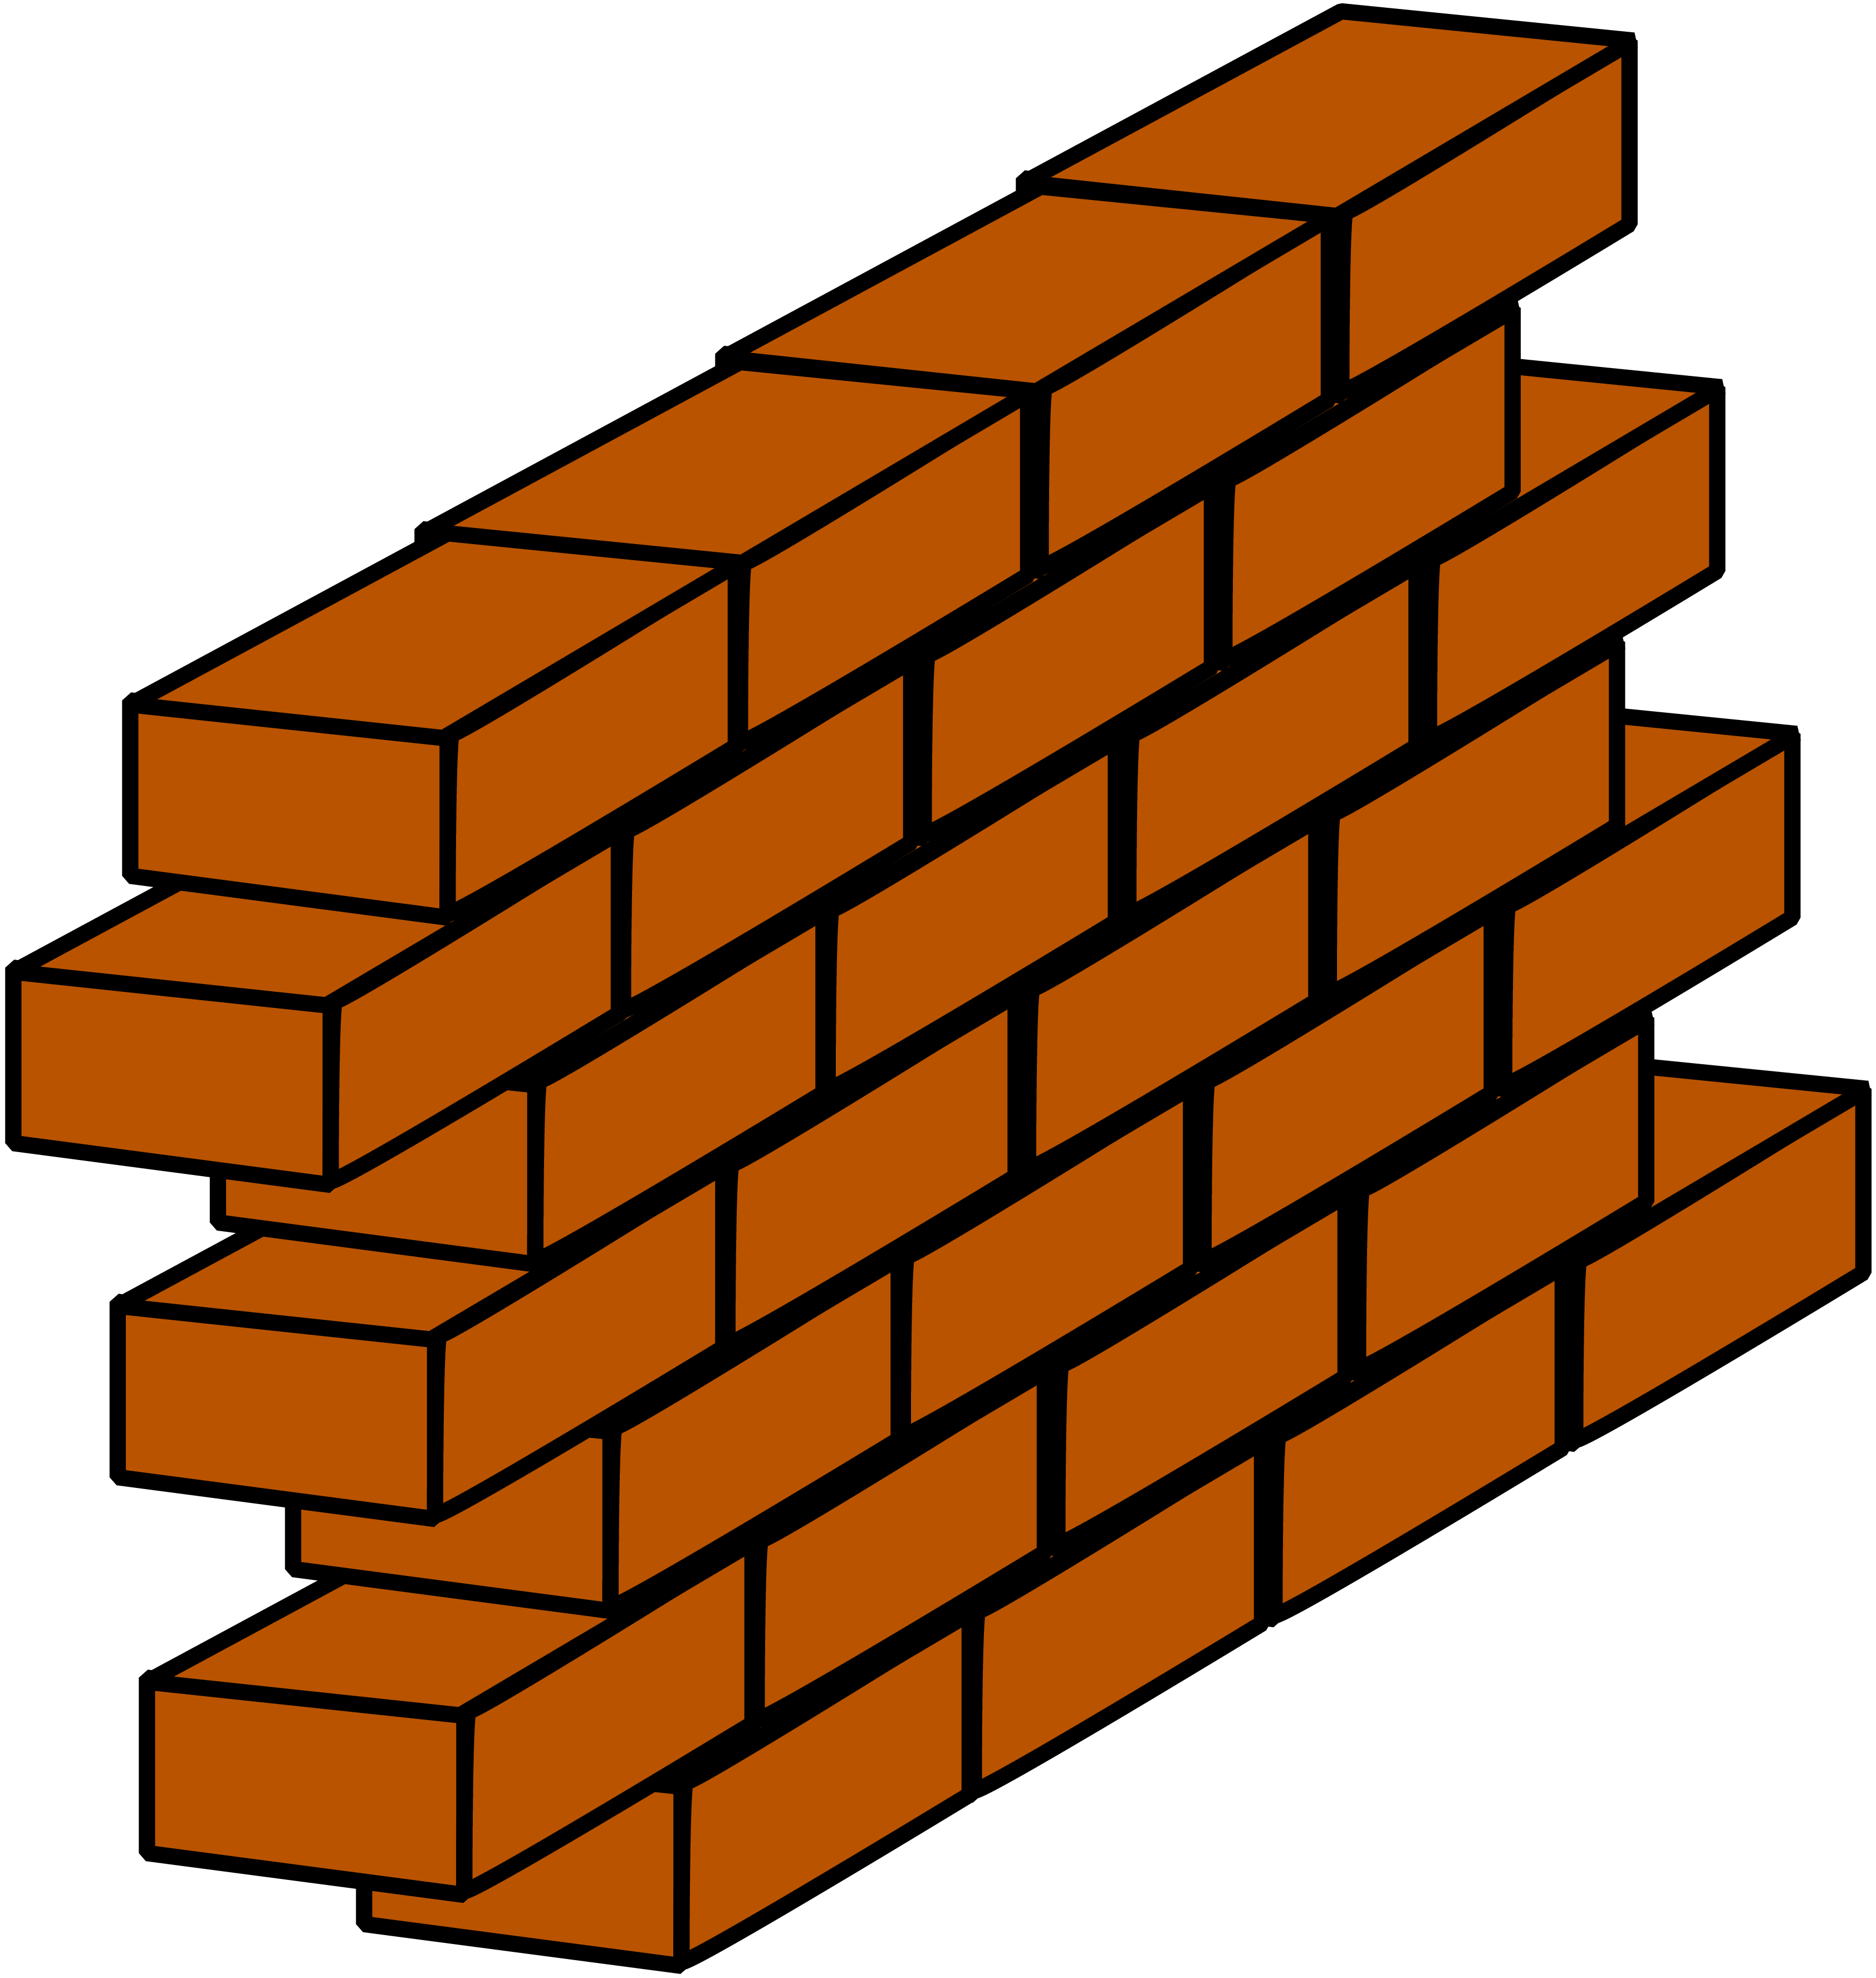 vector transparent download Wall clipart. Brick walls clipground clip.